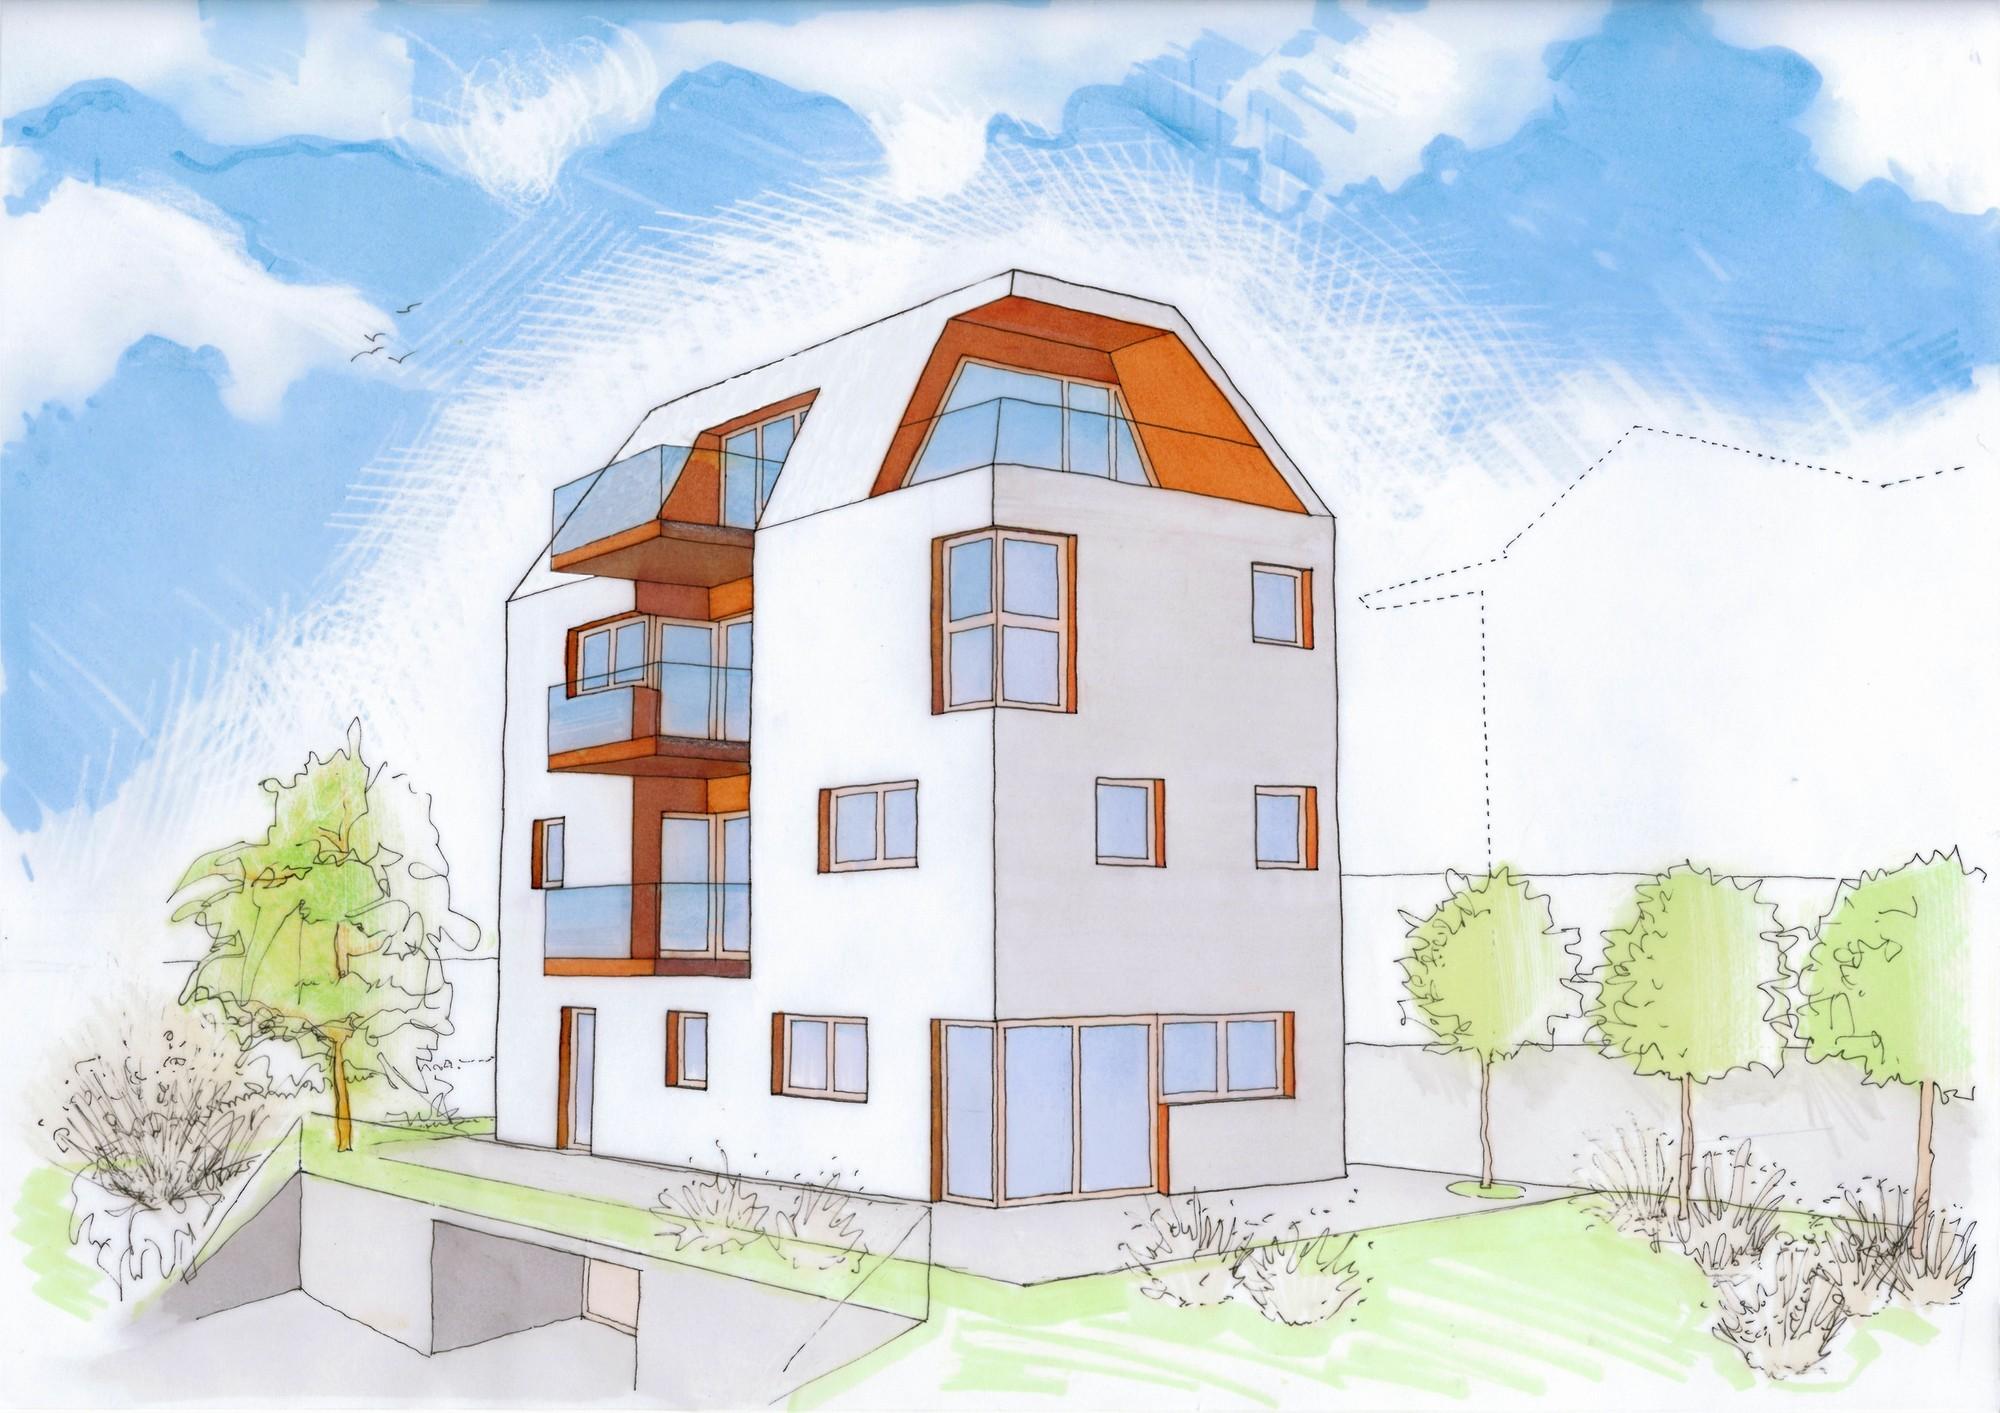 Gallery of gi multi family housing burnazzi feltrin for Multi family architecture